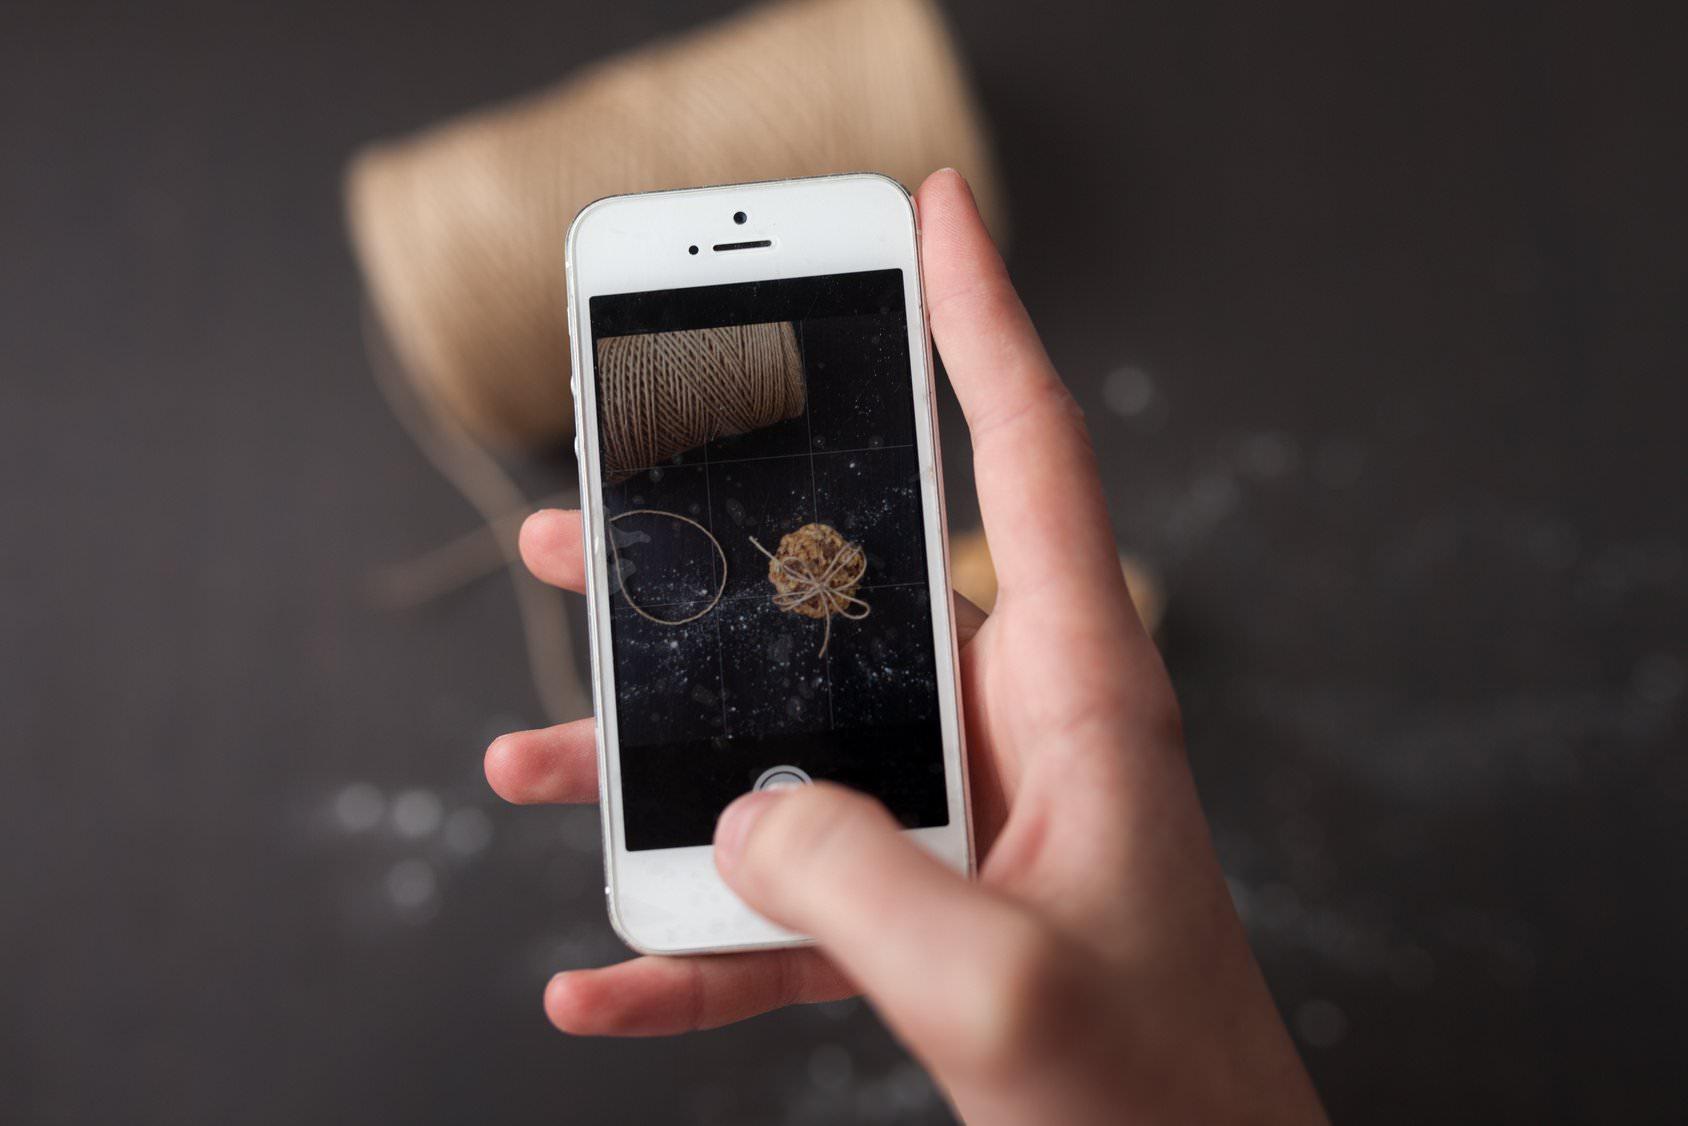 produktfotos wie bei amazon trotz smartphone. Black Bedroom Furniture Sets. Home Design Ideas